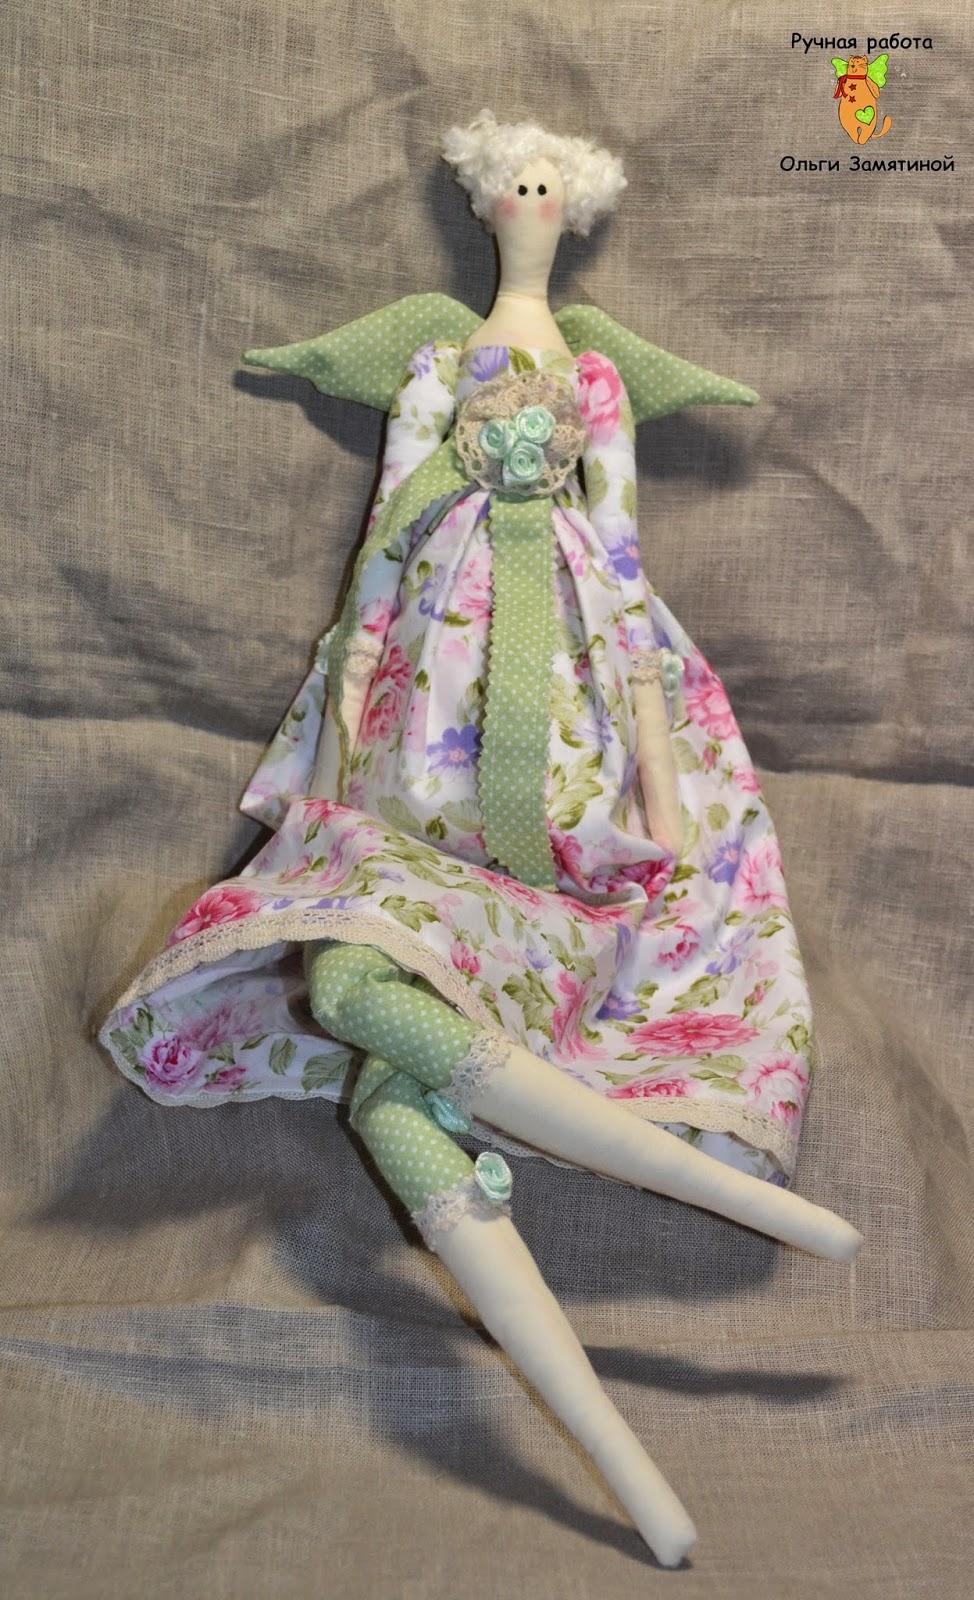 Рукоделие кукла тильда своими руками